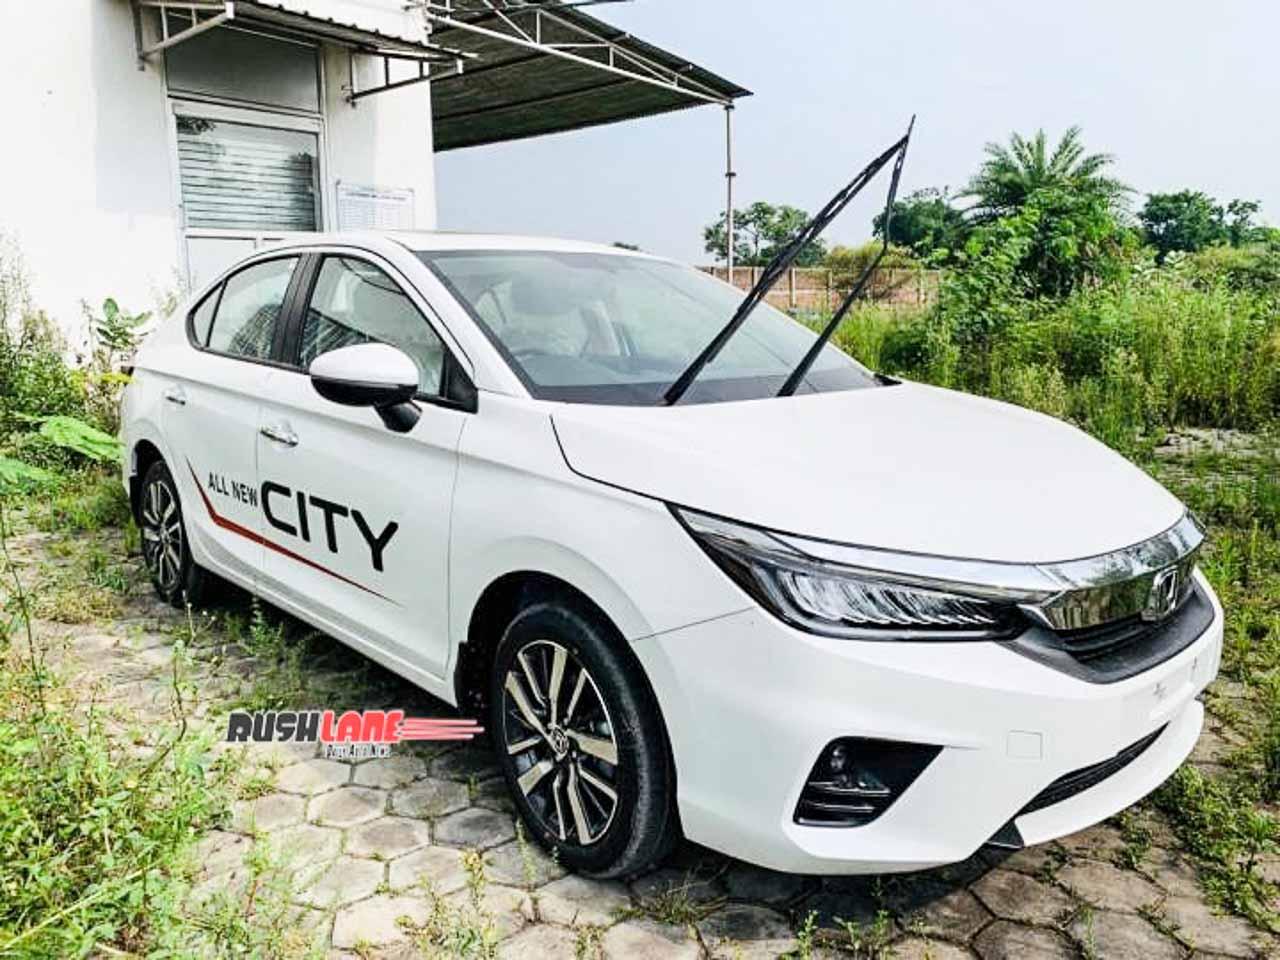 2020 Honda City test drive models start reaching dealership yards